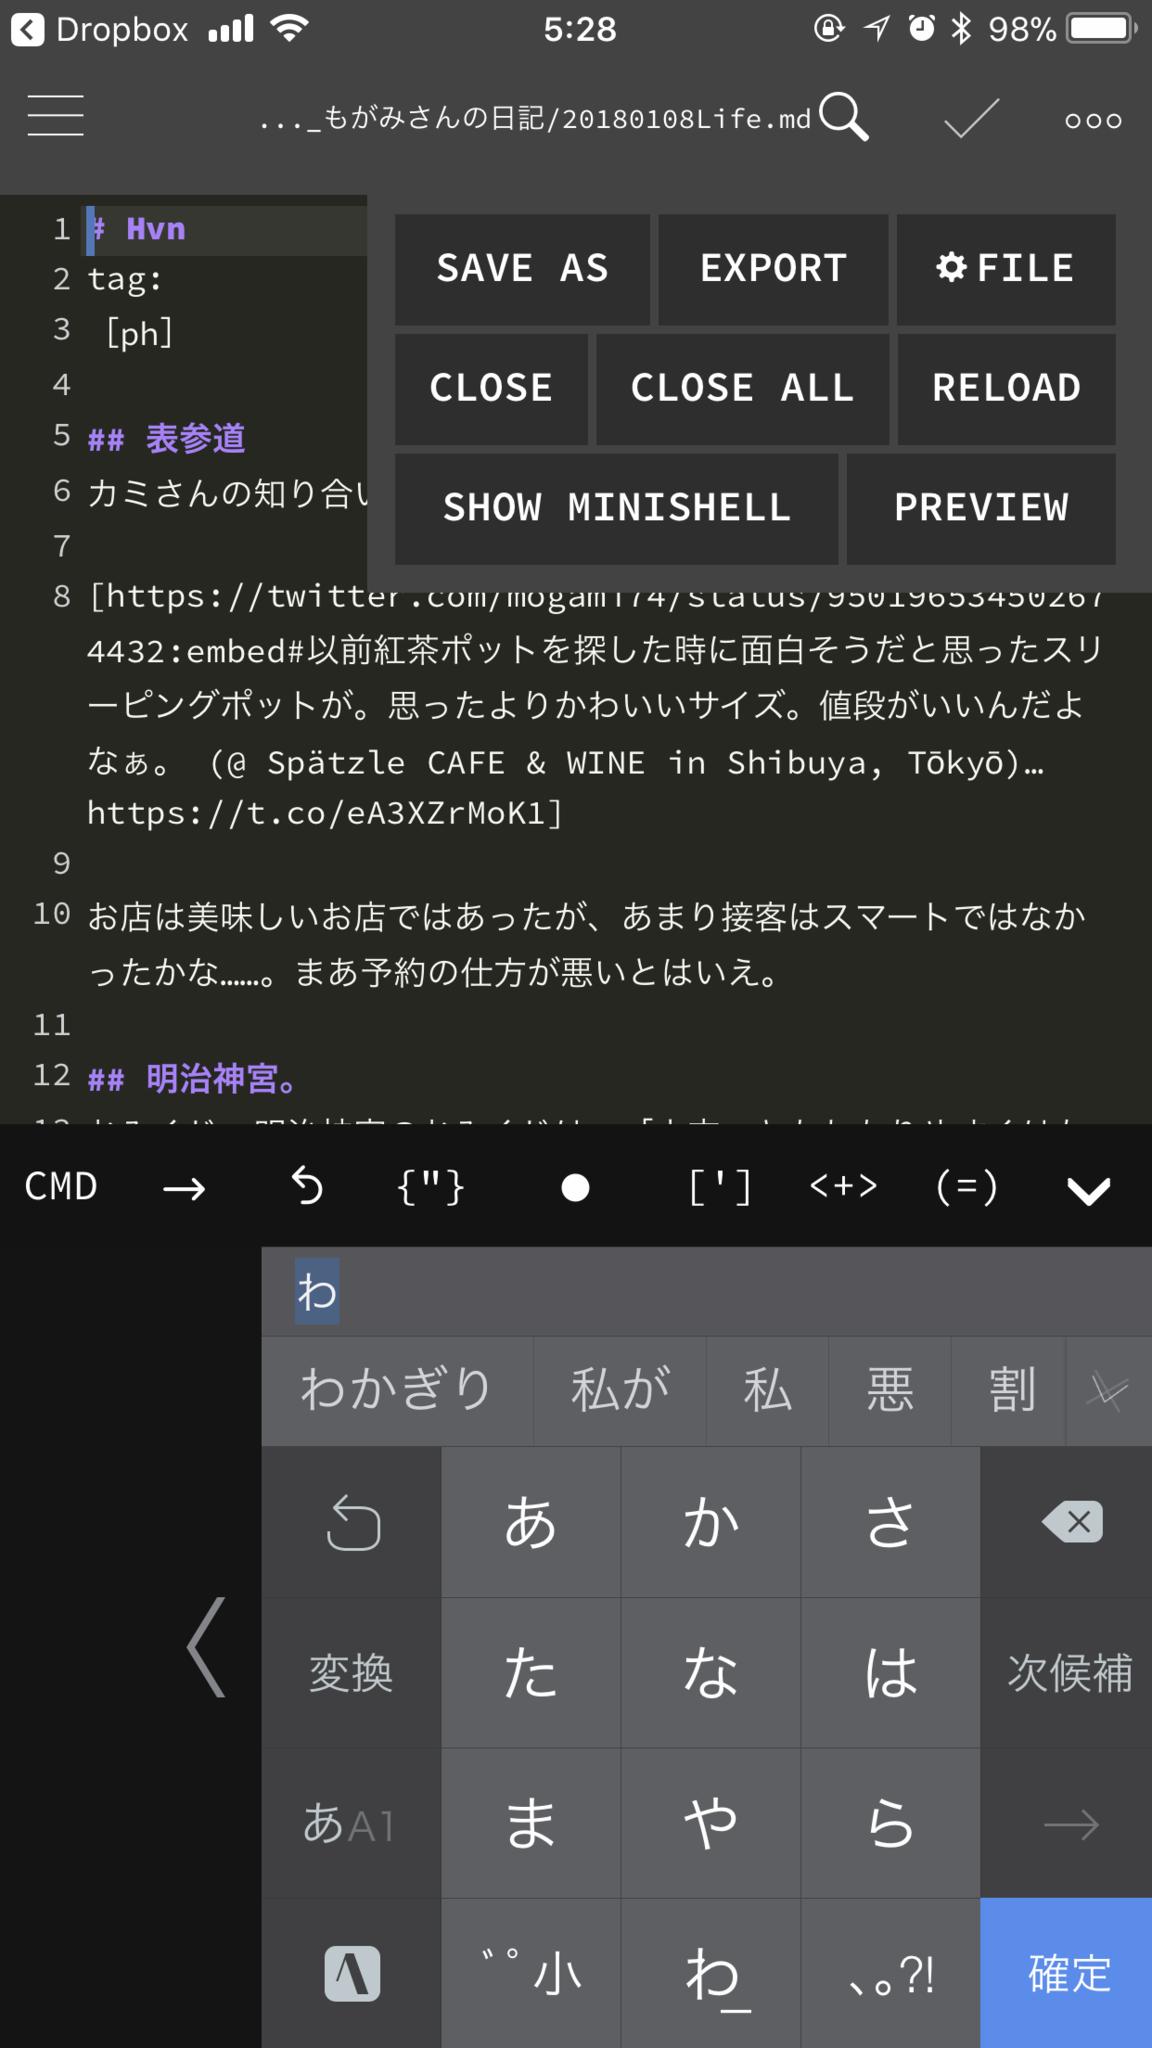 f:id:mogami74:20180622052053p:plain